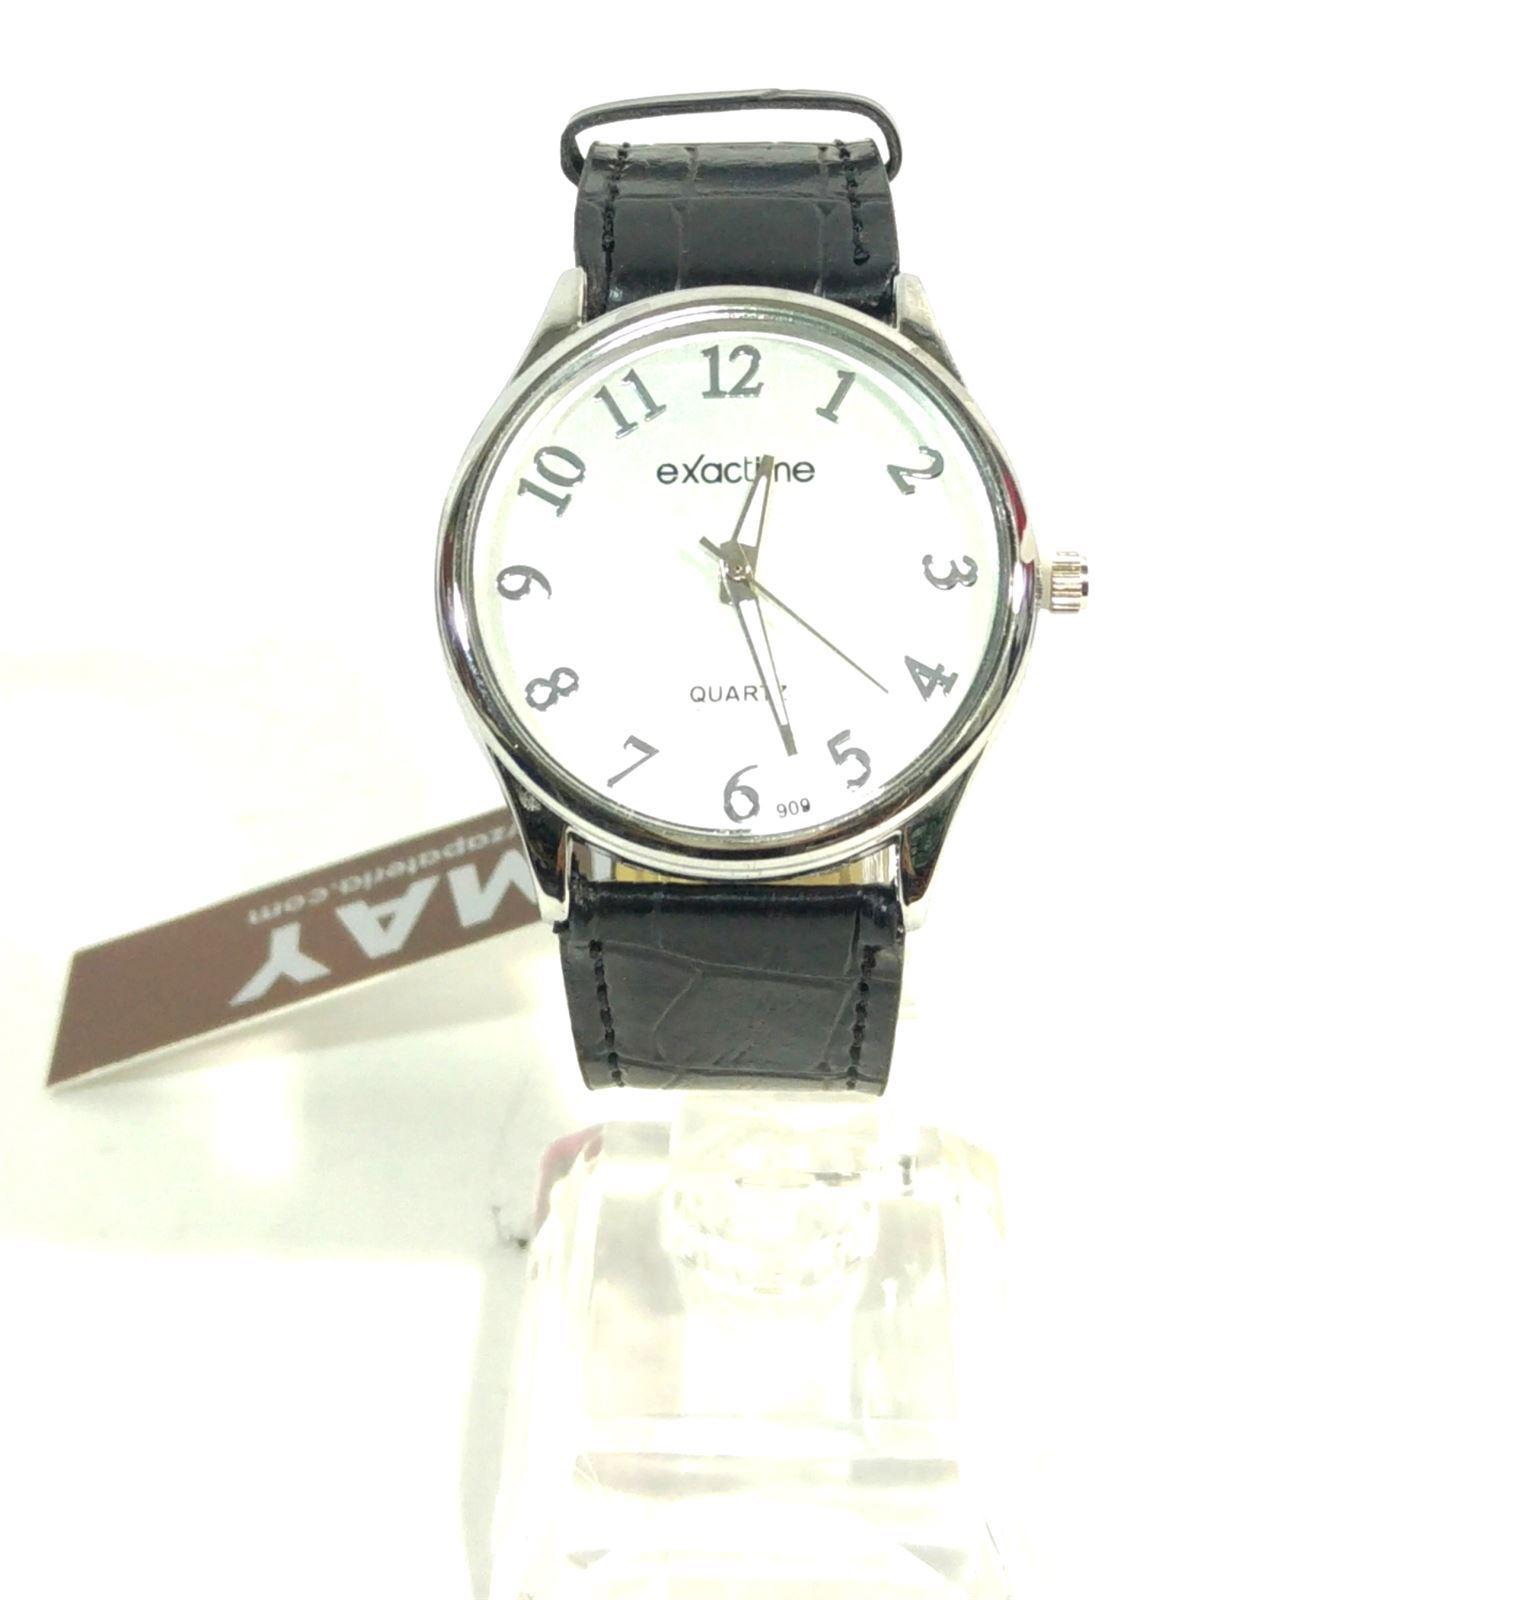 Reloj correa negra-esfera blanca - Imagen 1 98c64e562d3e